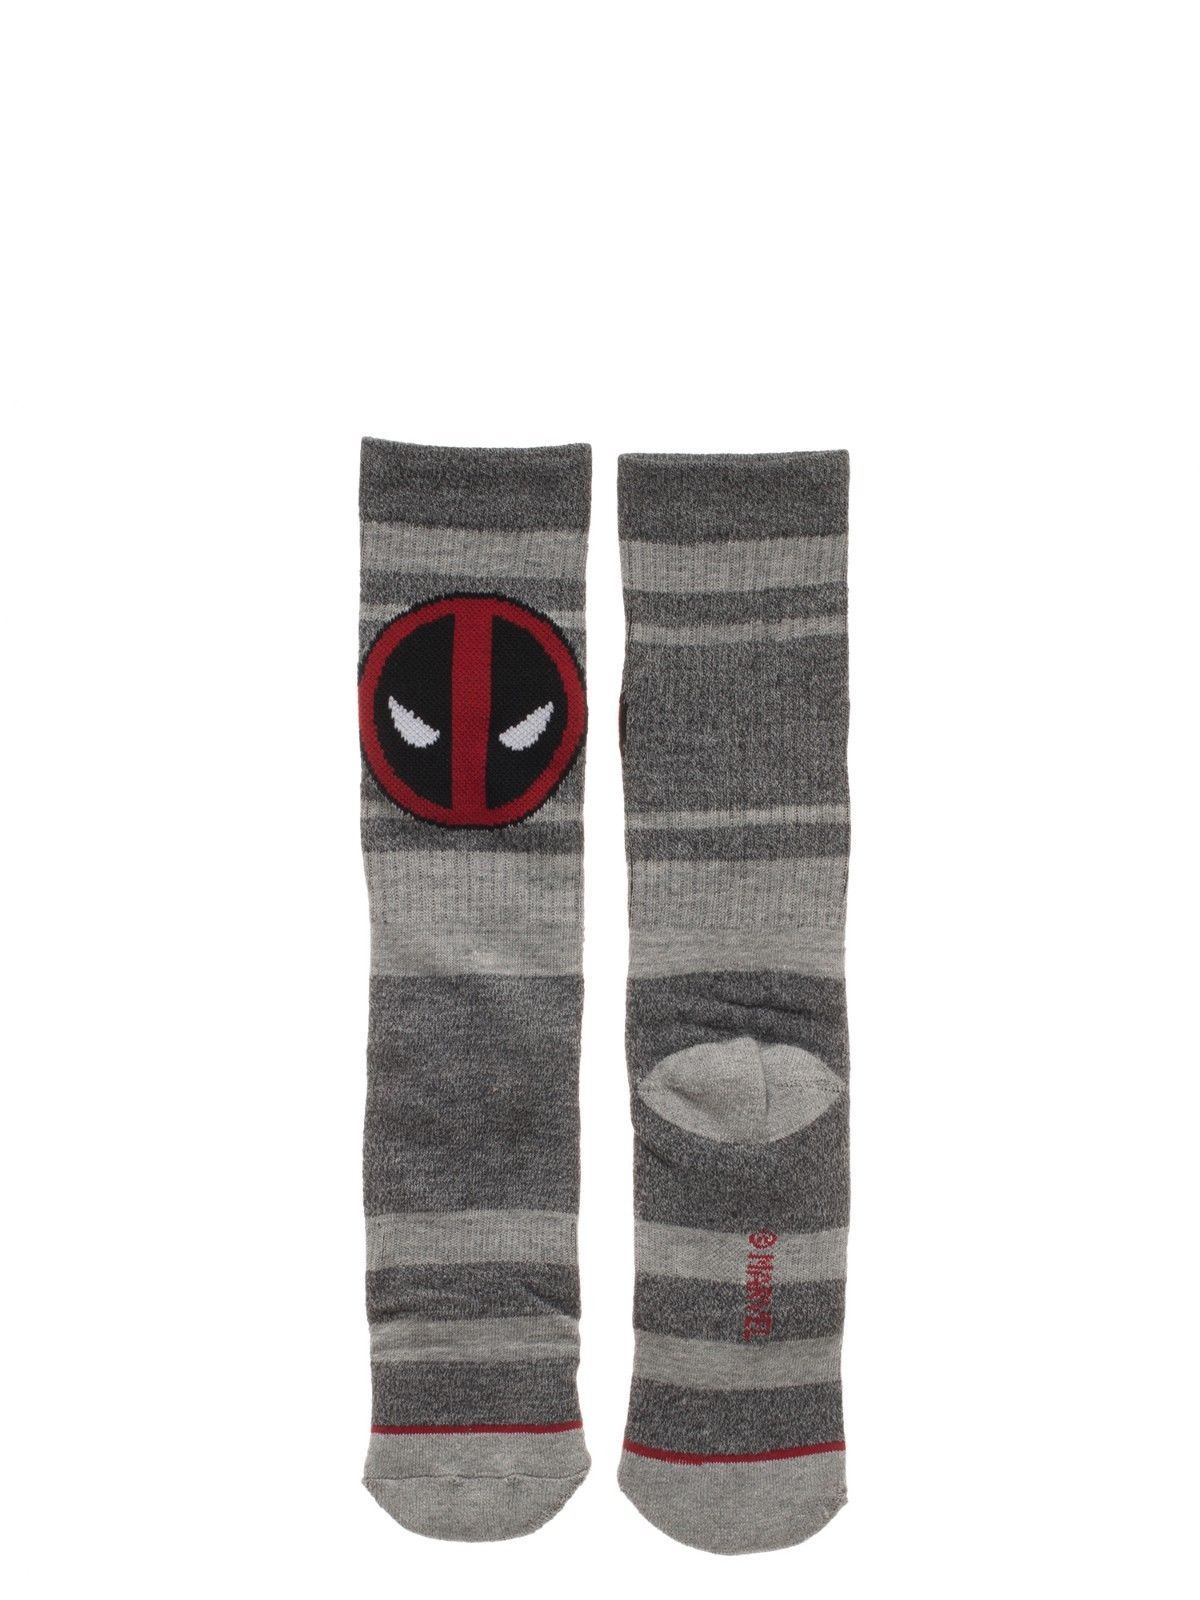 Deadpool Marvel Comics 3 Pack Athletic Active Crew Socks Nwt